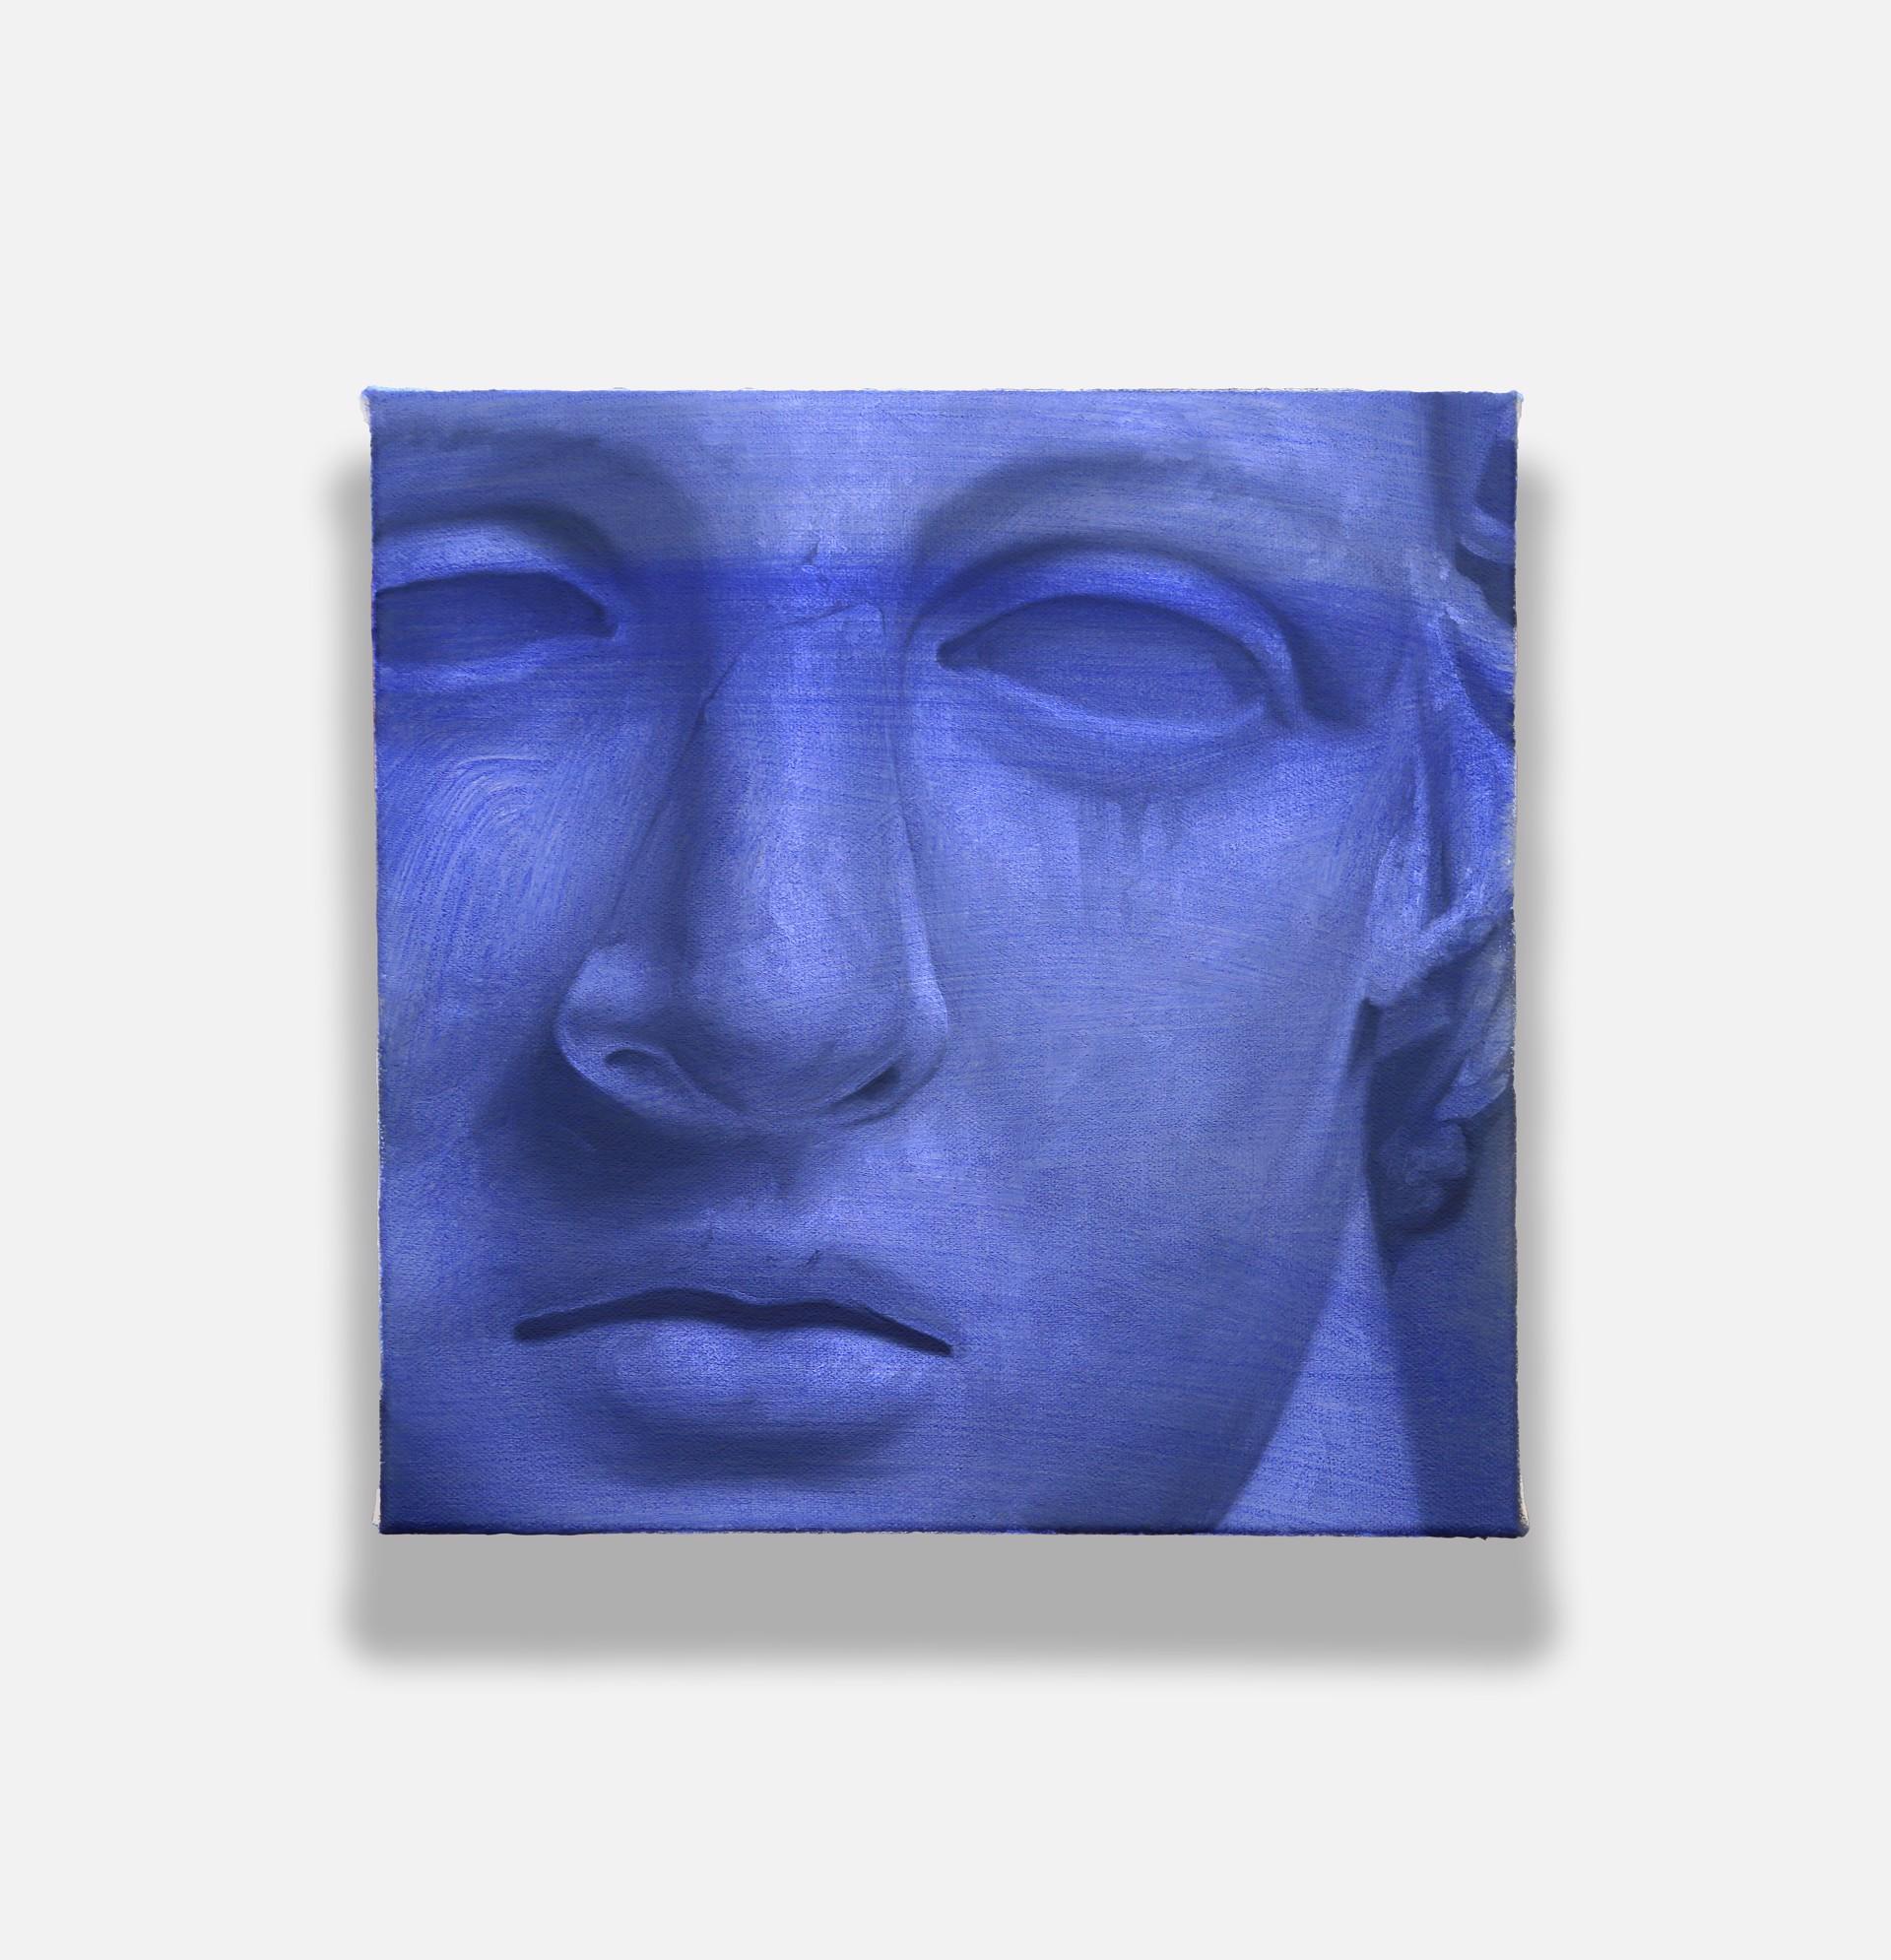 (Study In Blue) by Shawn Huckins